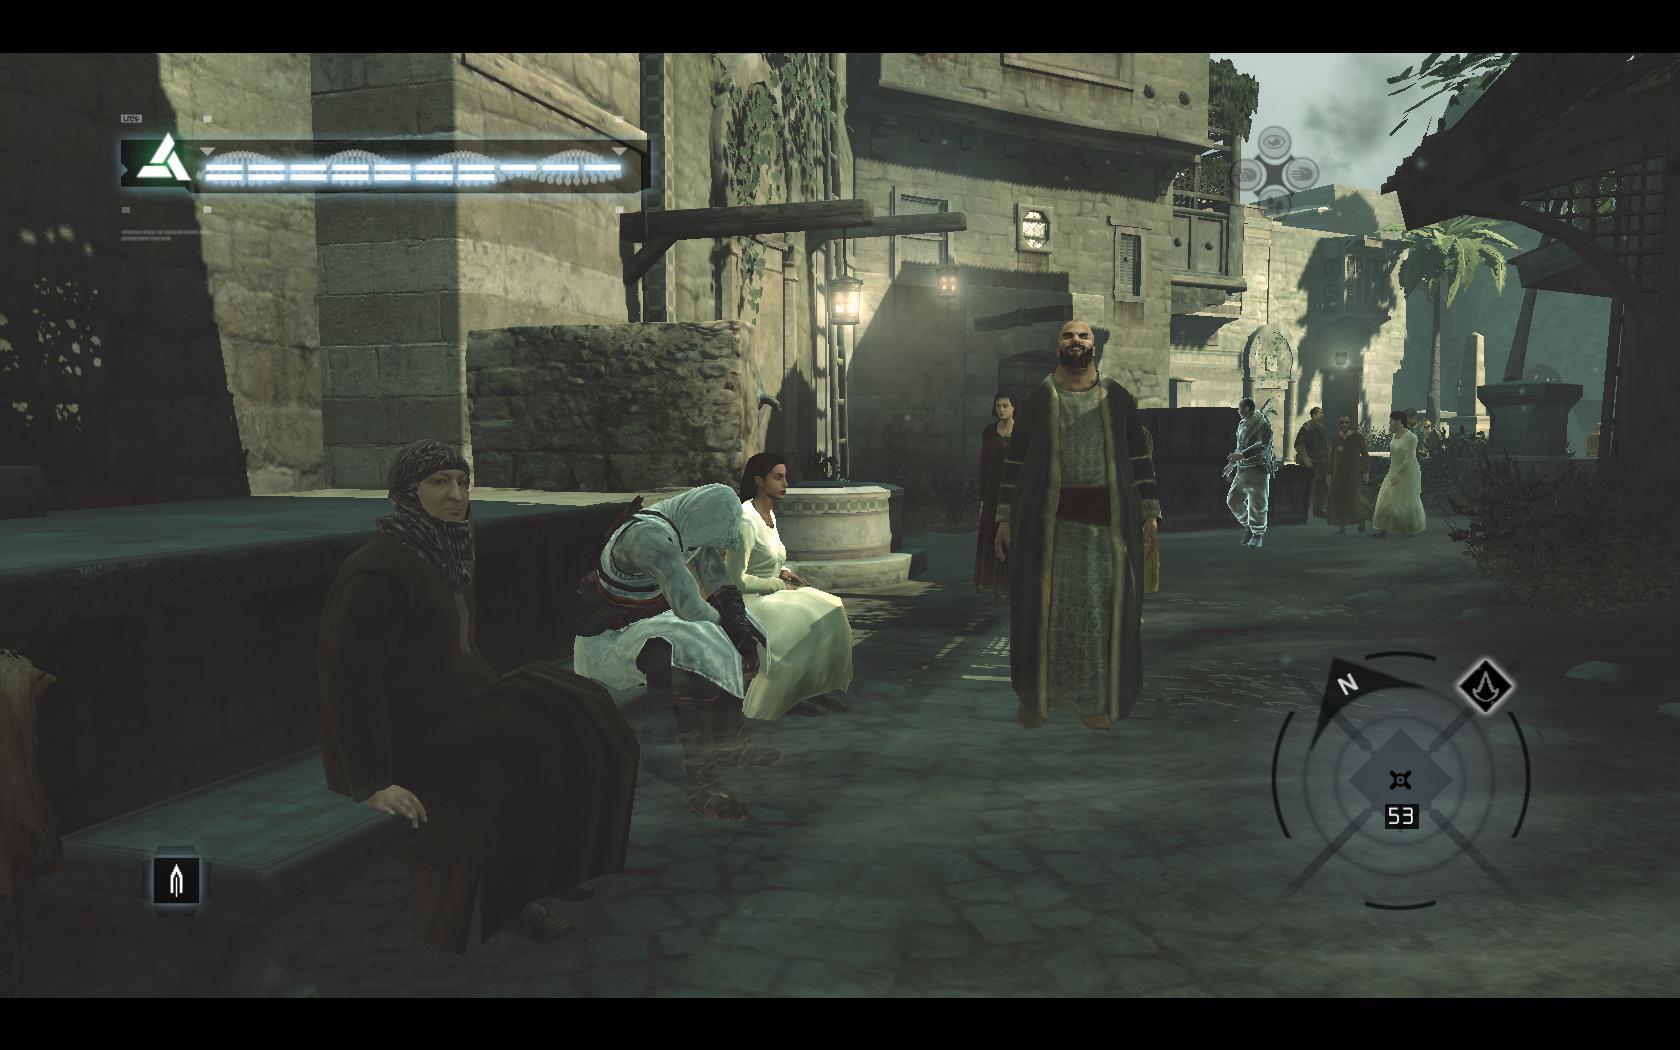 assassinscreed_dx10_2008_04_17_20_20_24_54